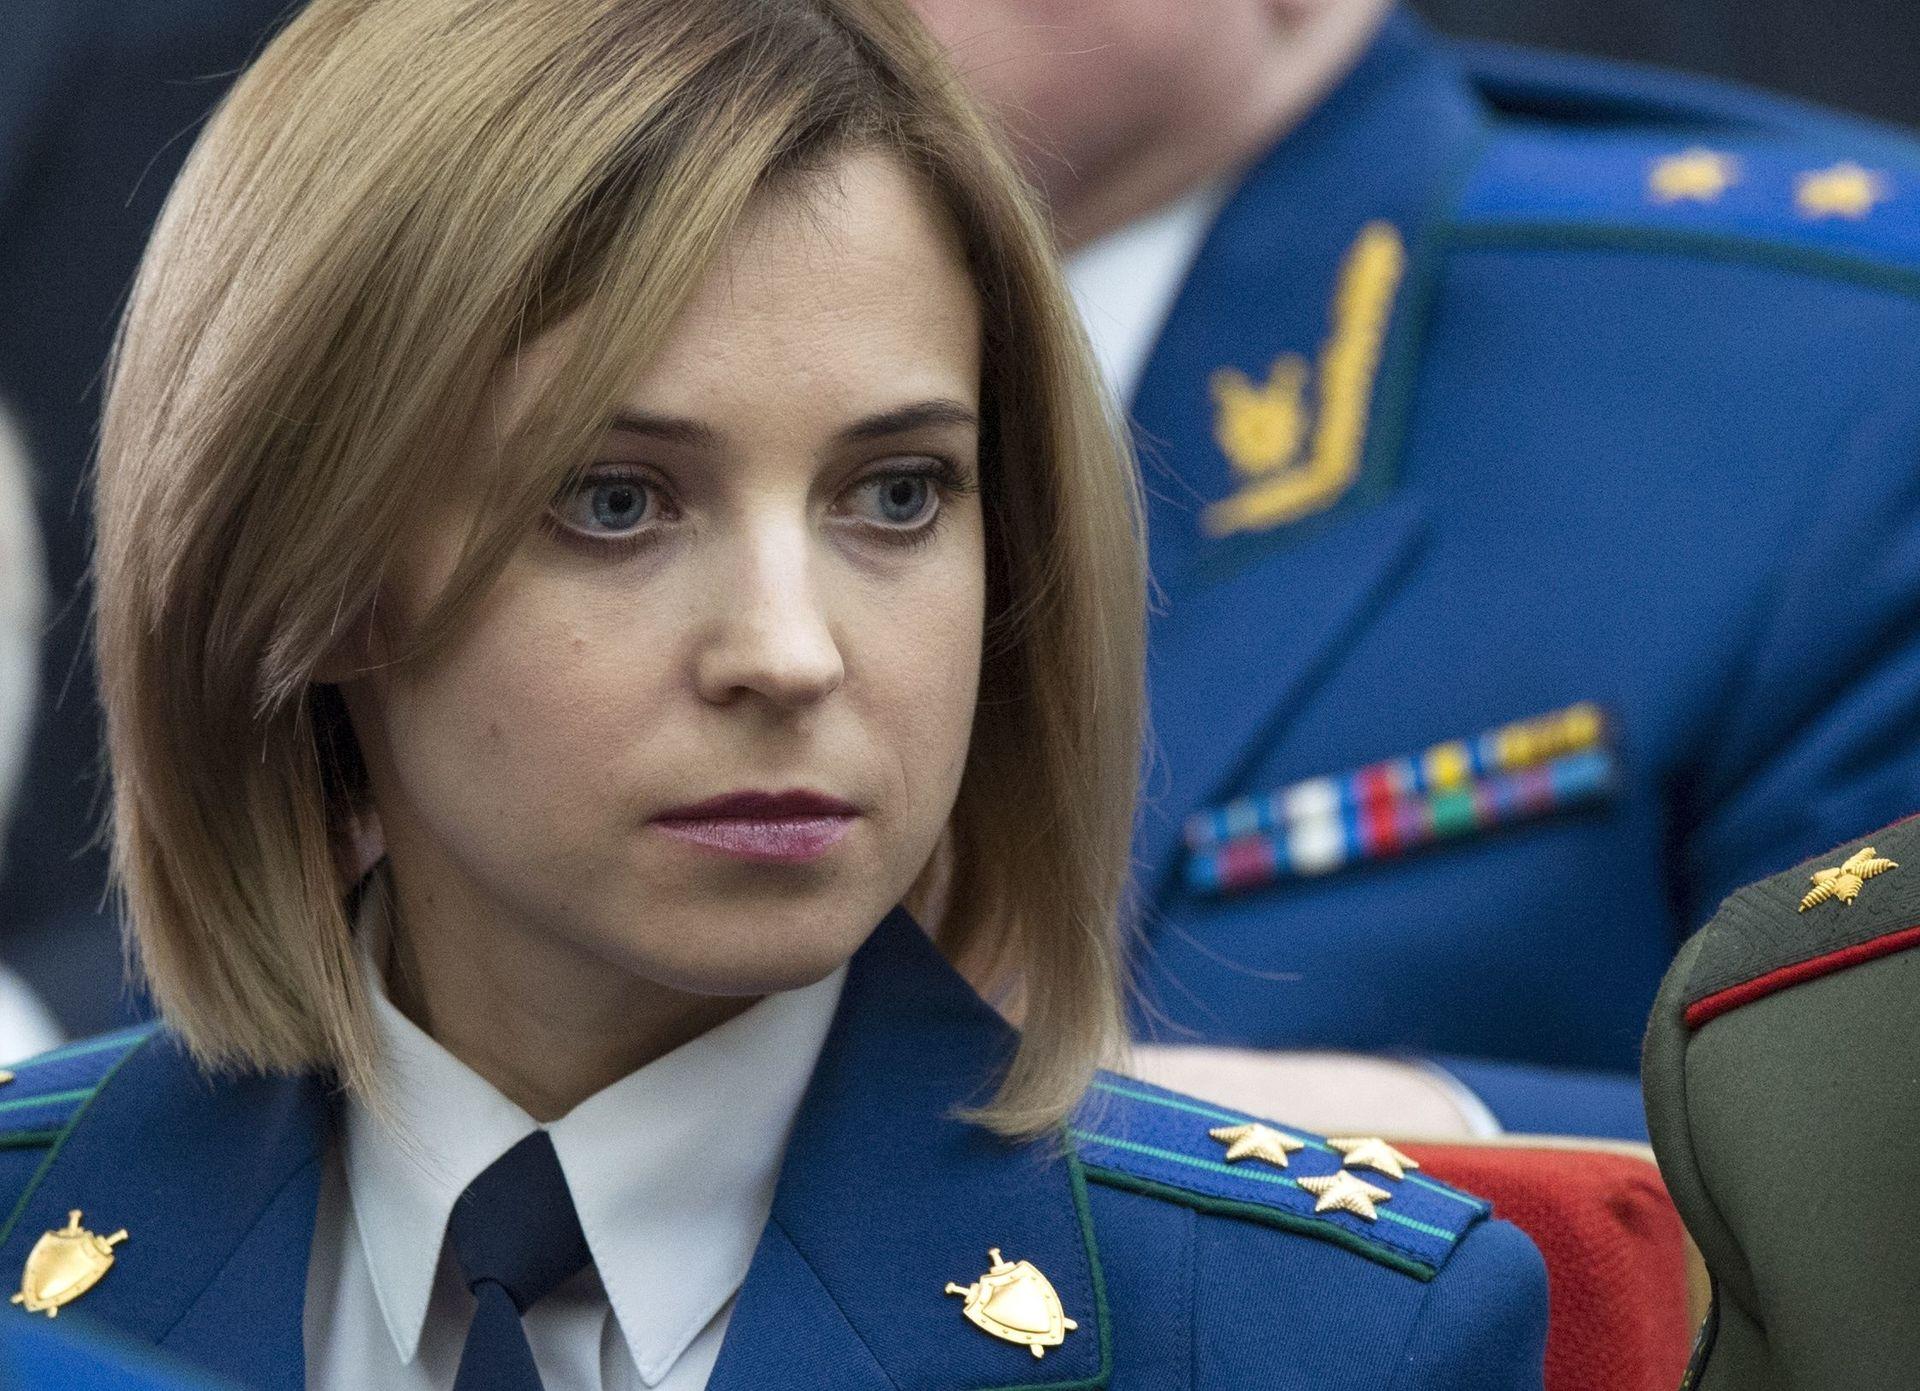 Девушка в форме прокурора фото 2